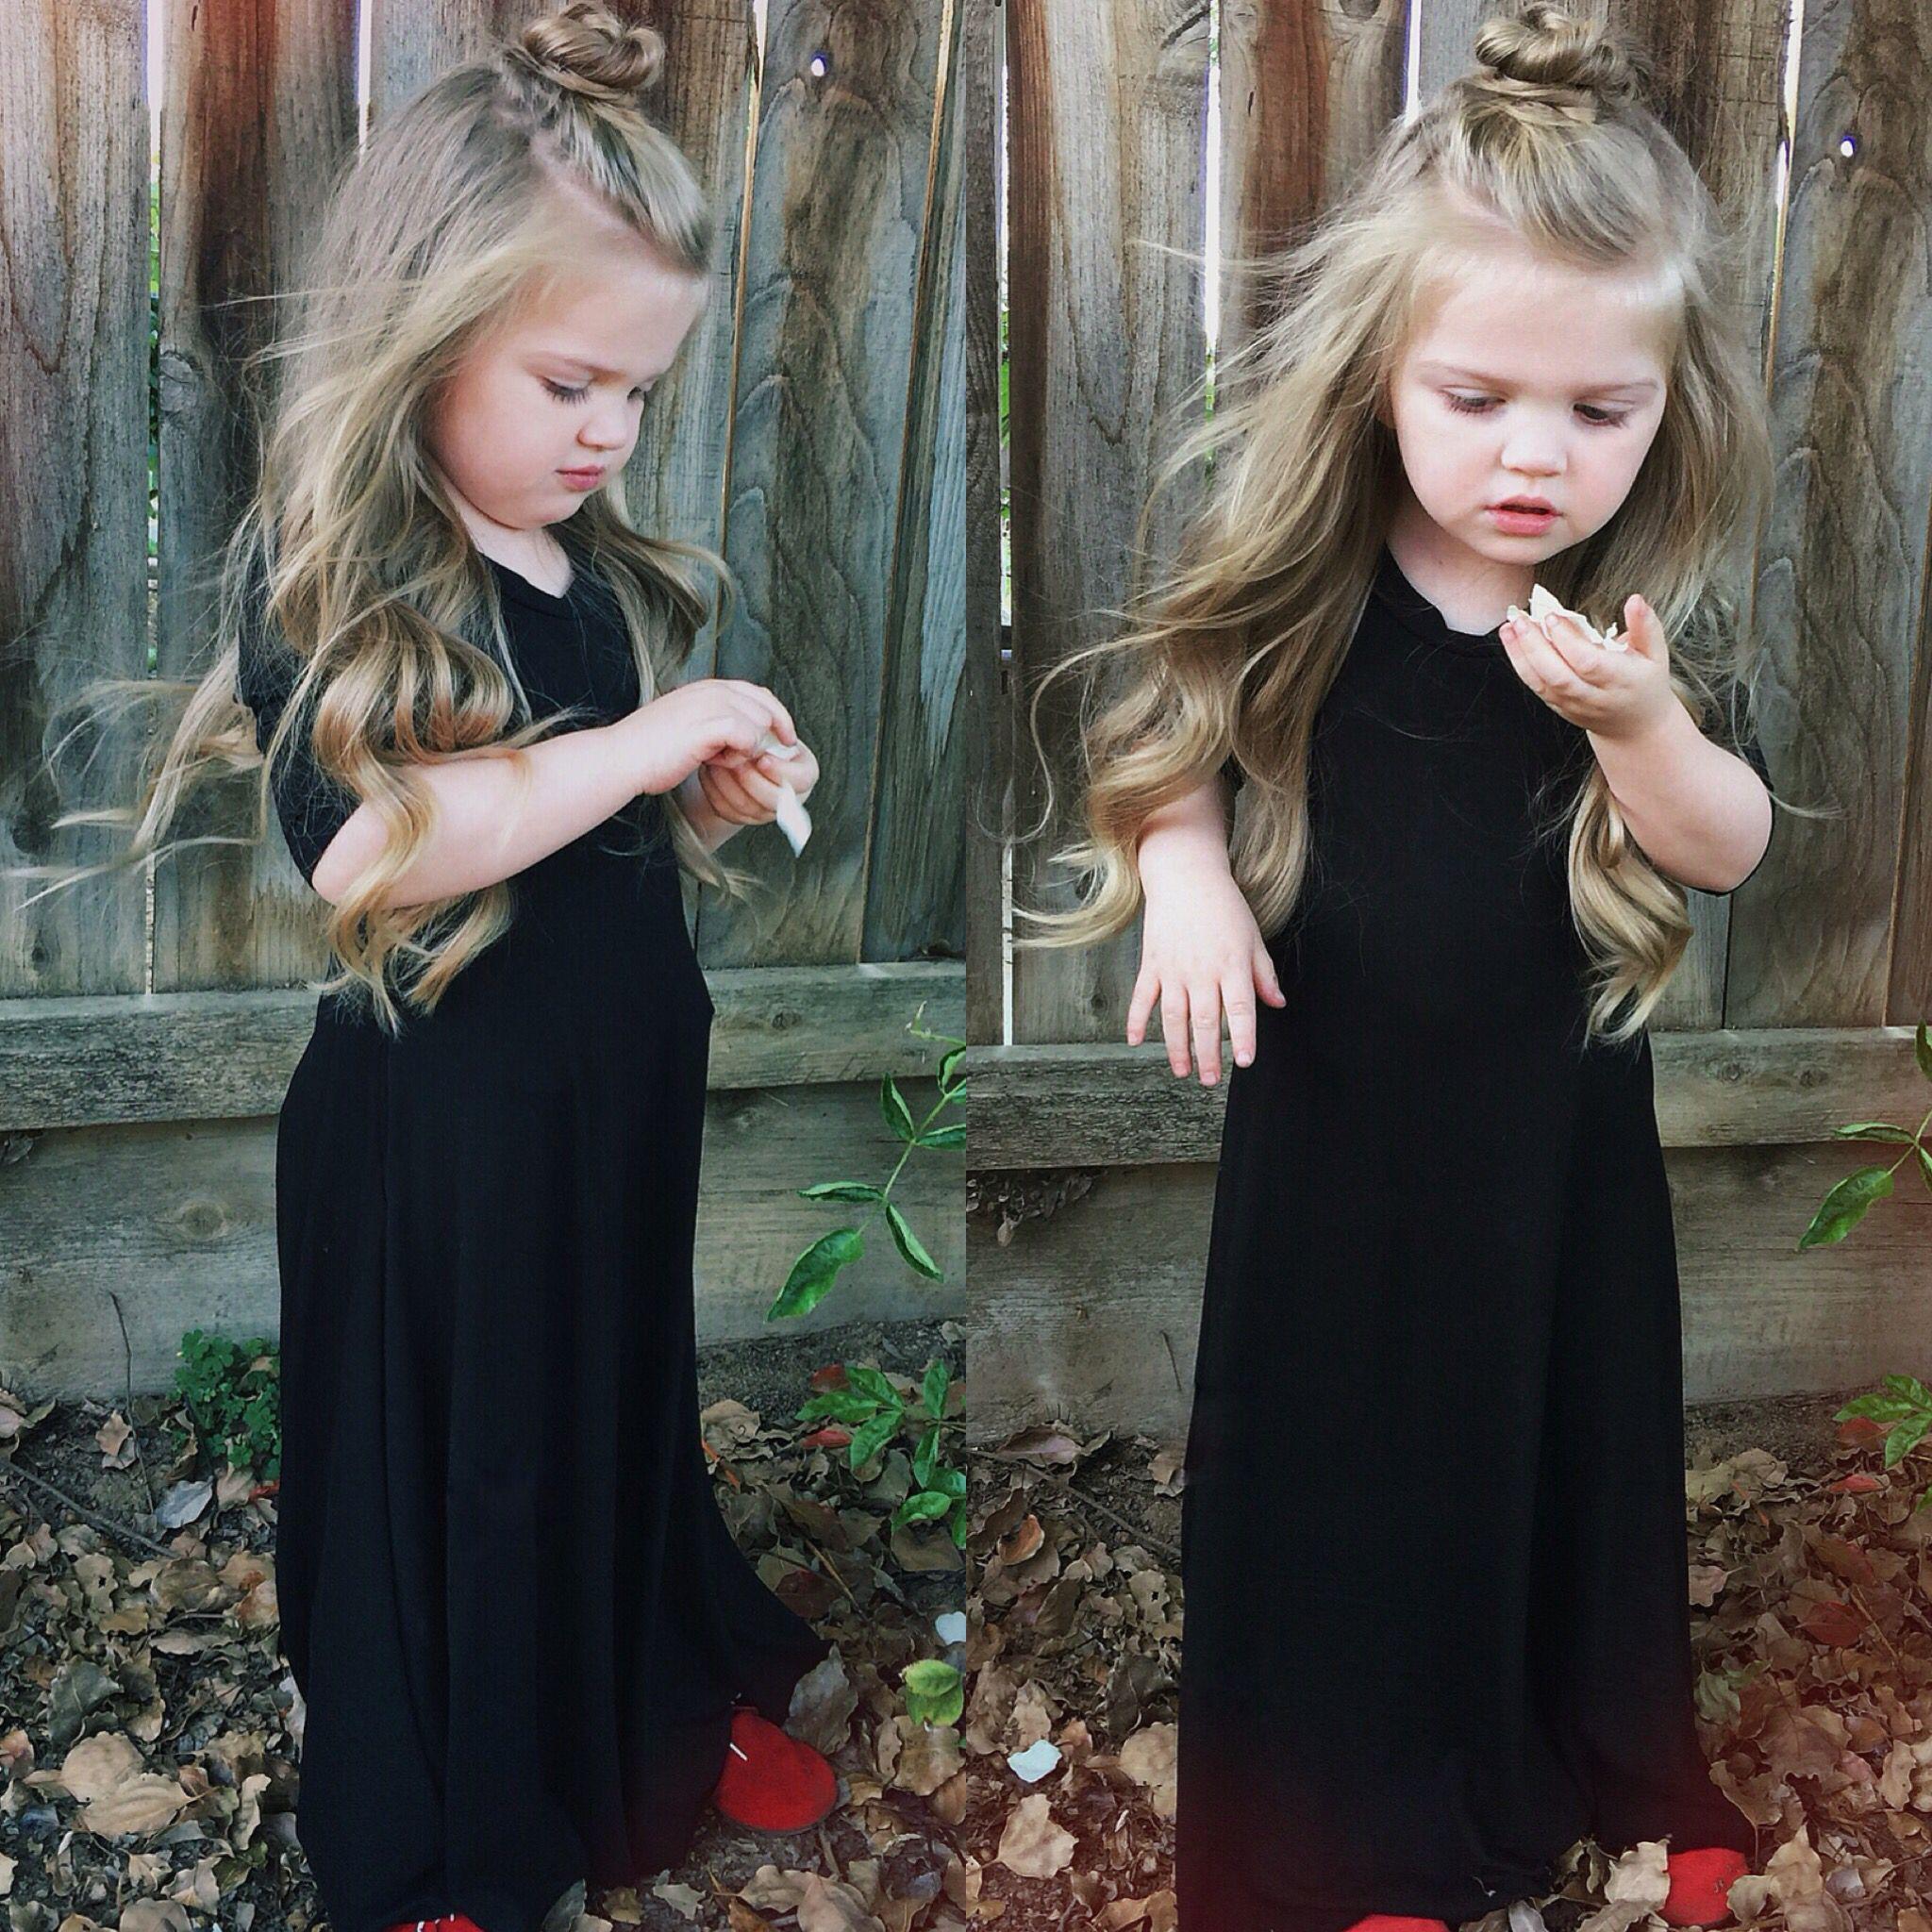 Top Knot Half Up Half Down Little Girl Hair Girl Hair Dos Kids Hairstyles Little Girl Hairstyles